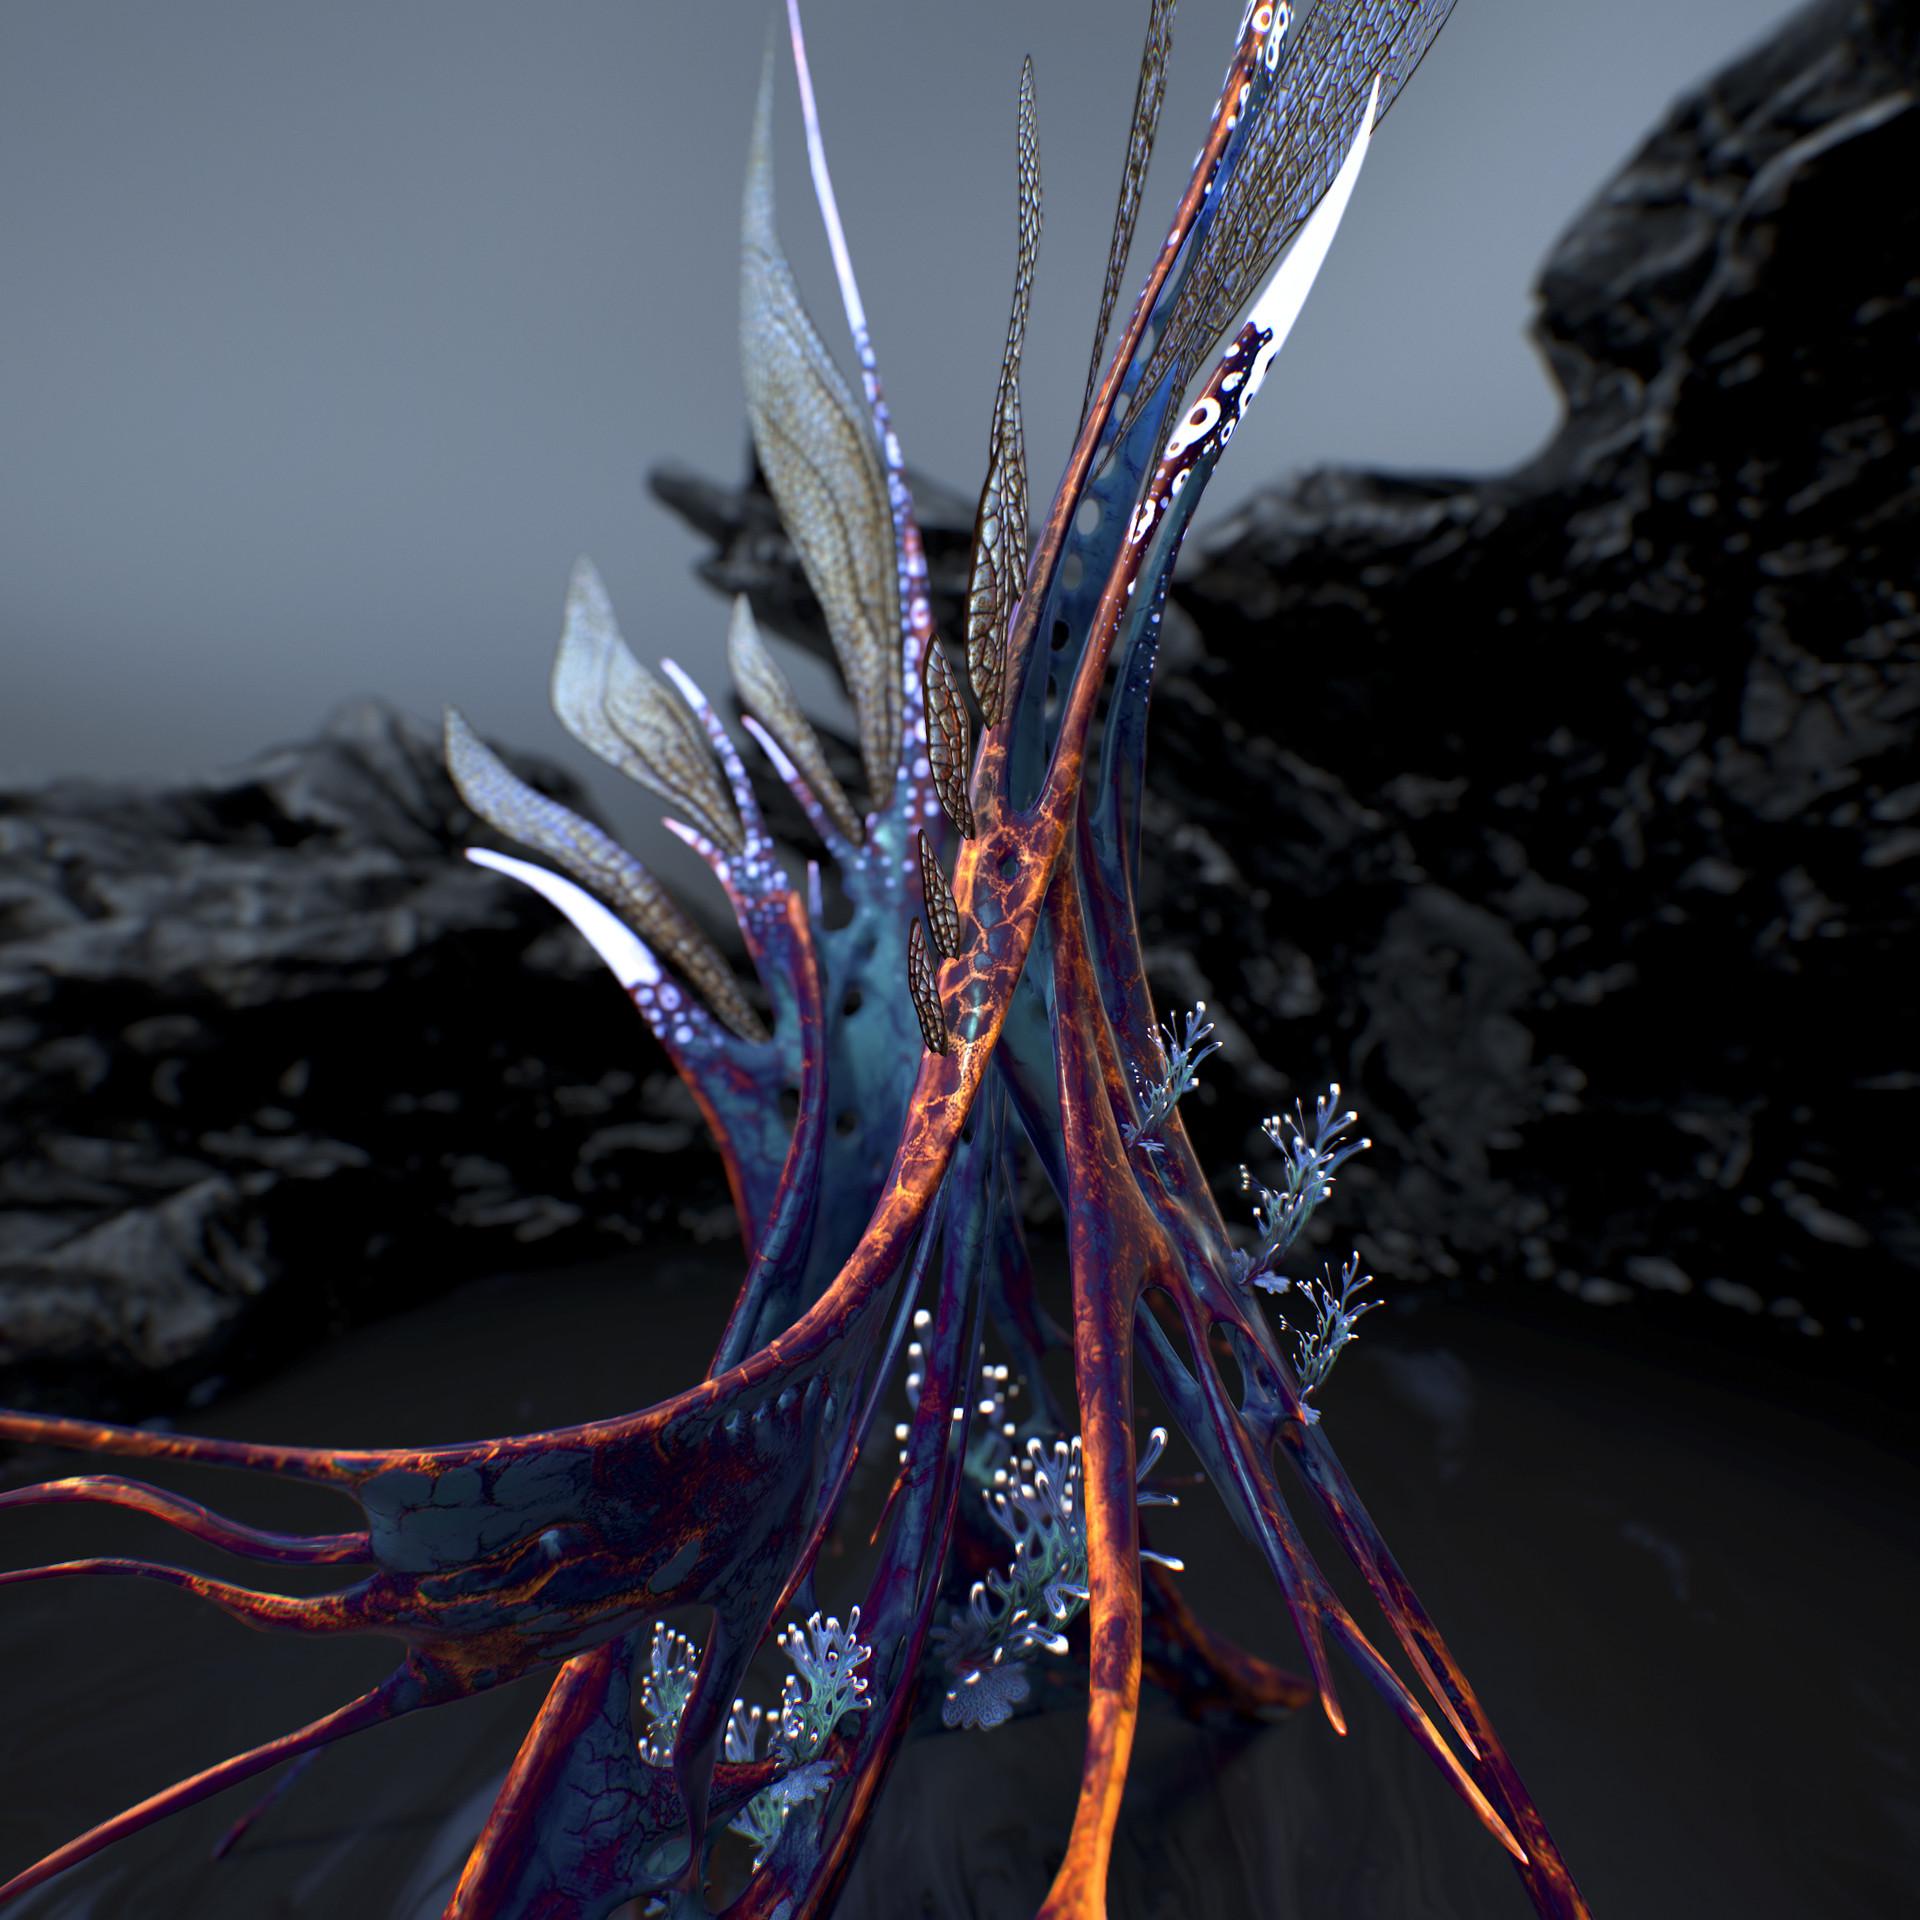 Johan de leenheer alien fern misota spletinus5